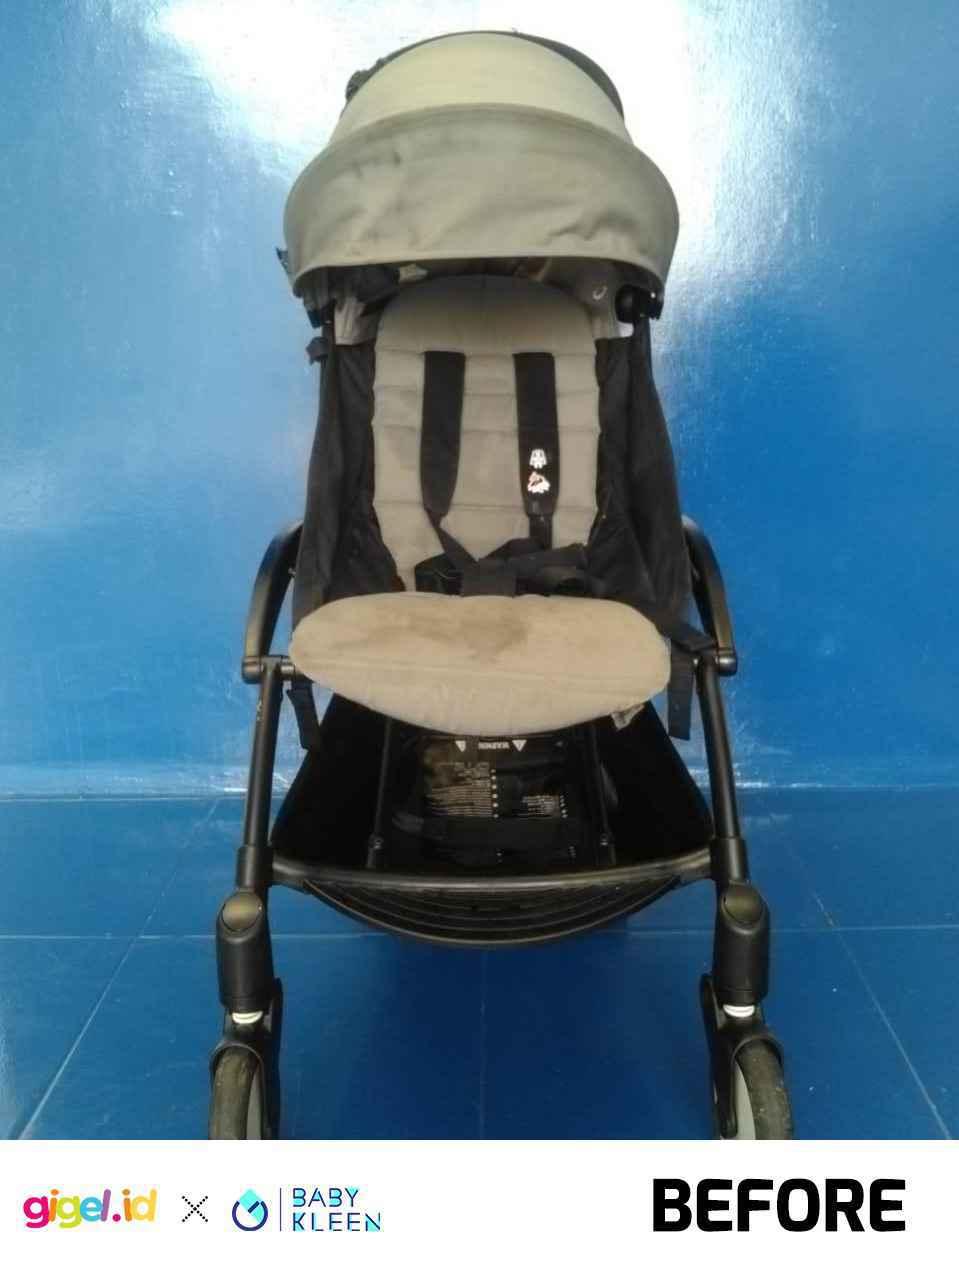 GIGEL.ID x Baby Kleen Laundry Stroller - 1